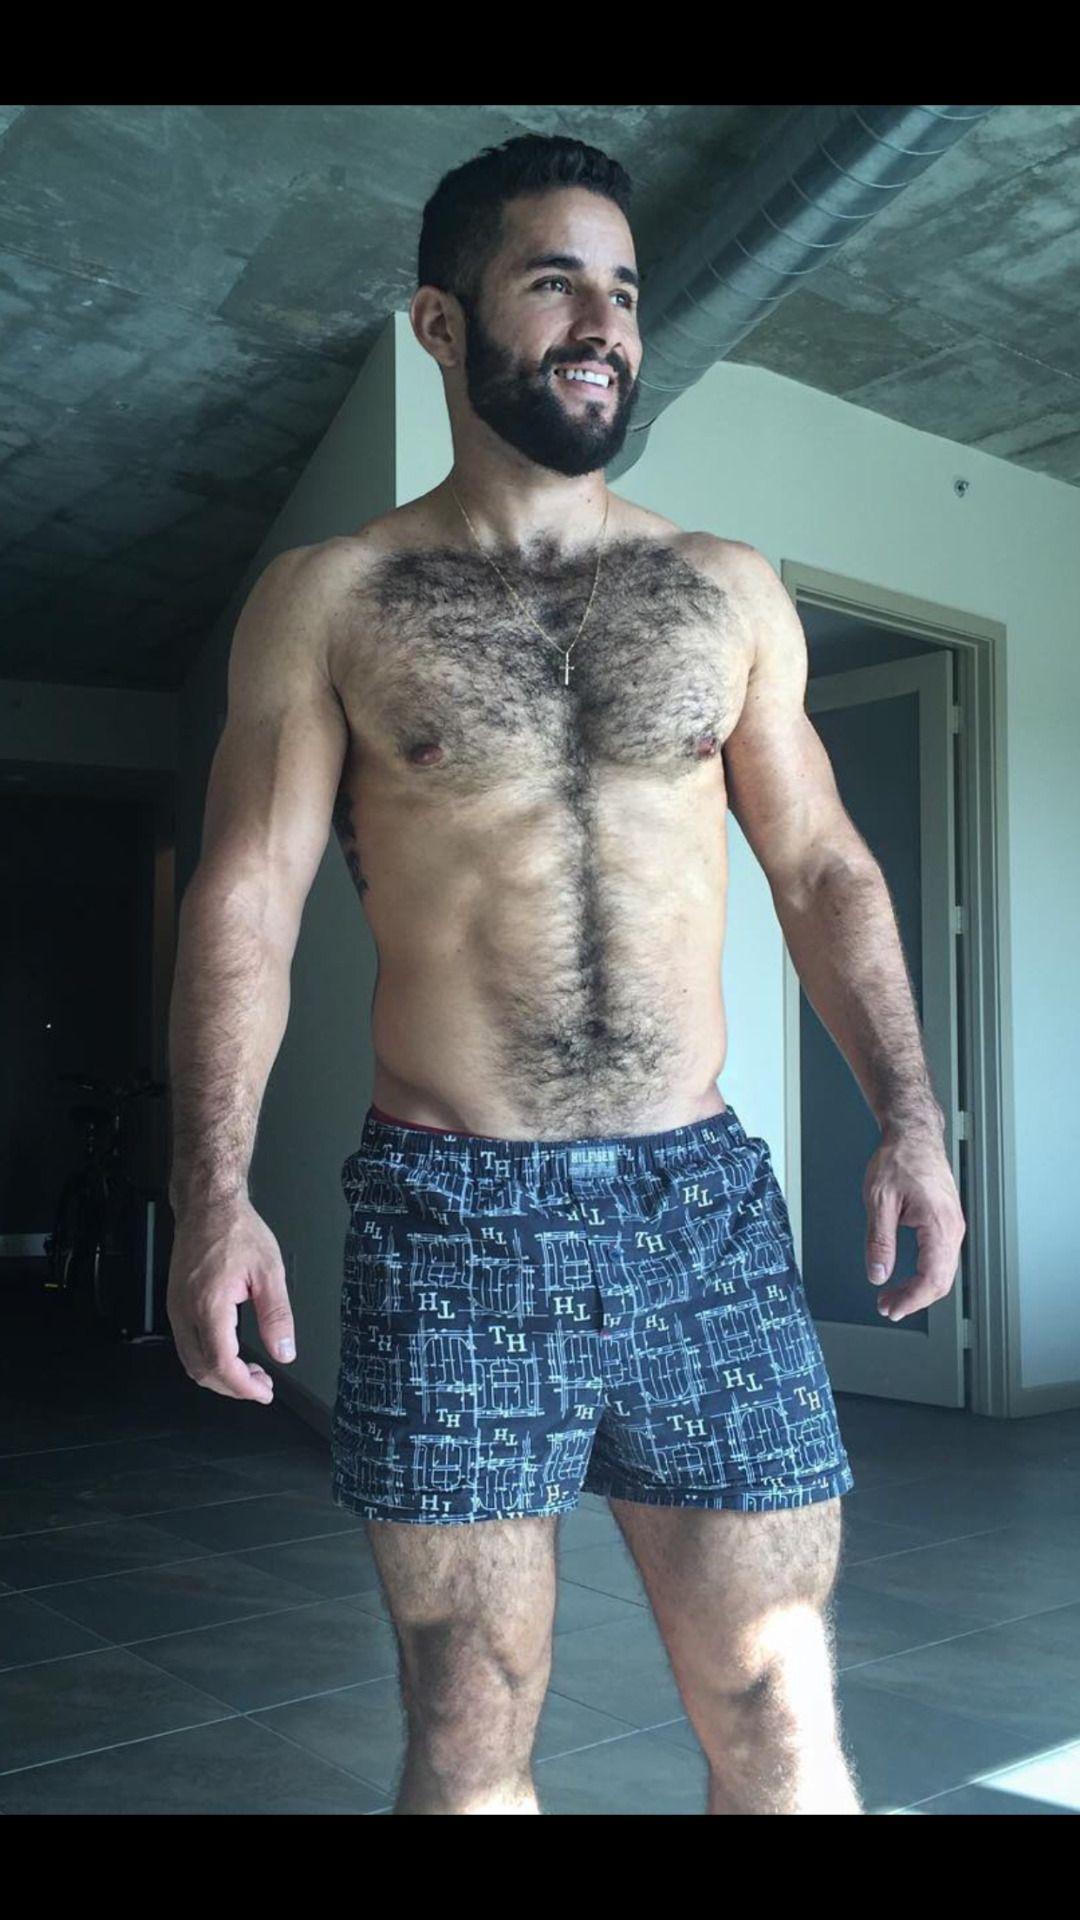 Braless bouncing boob clips